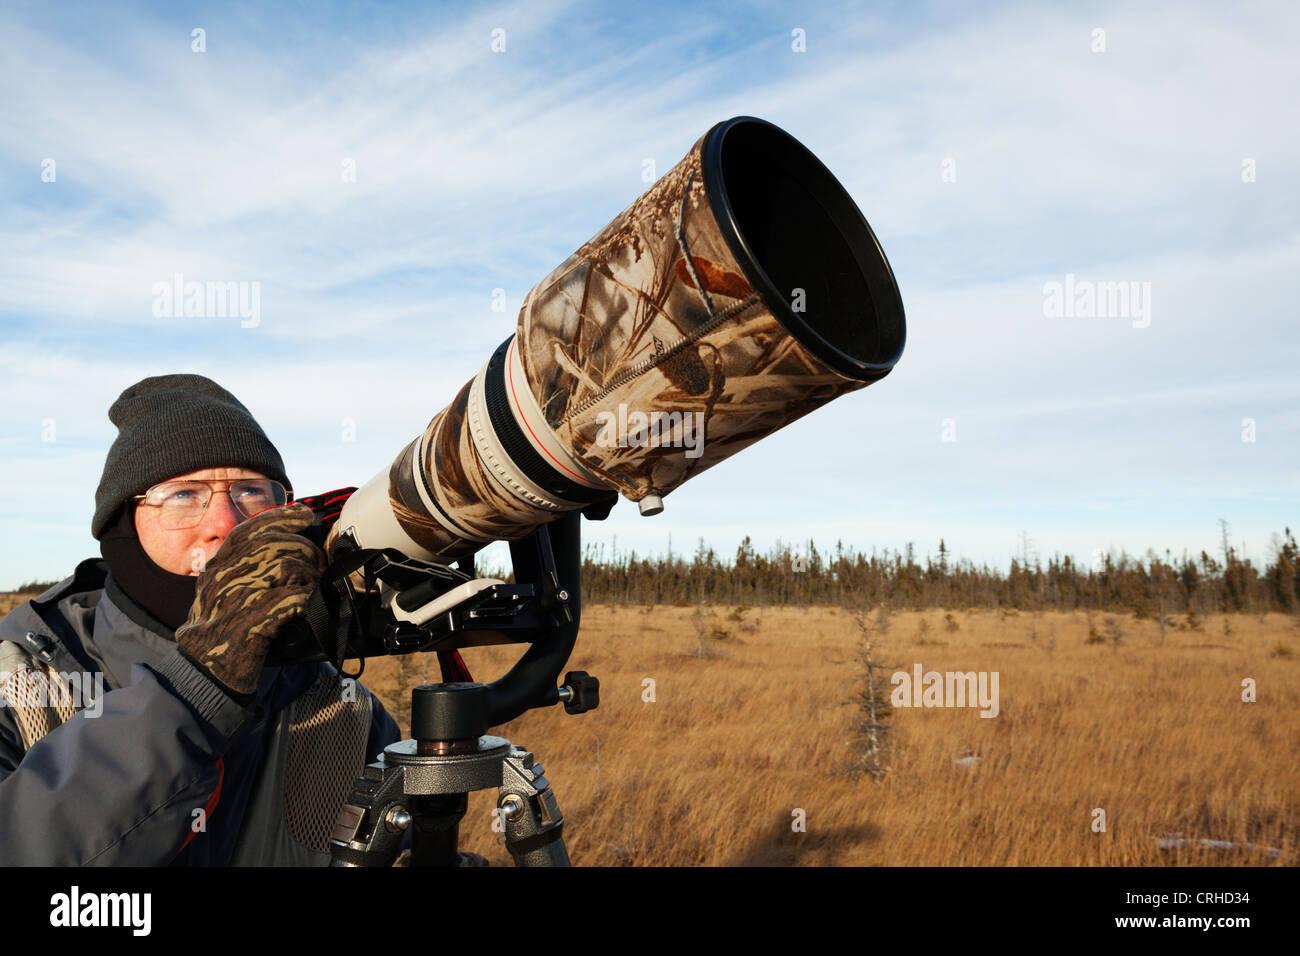 Un fotógrafo de la naturaleza silvestre mirando para las aves. Foto de stock